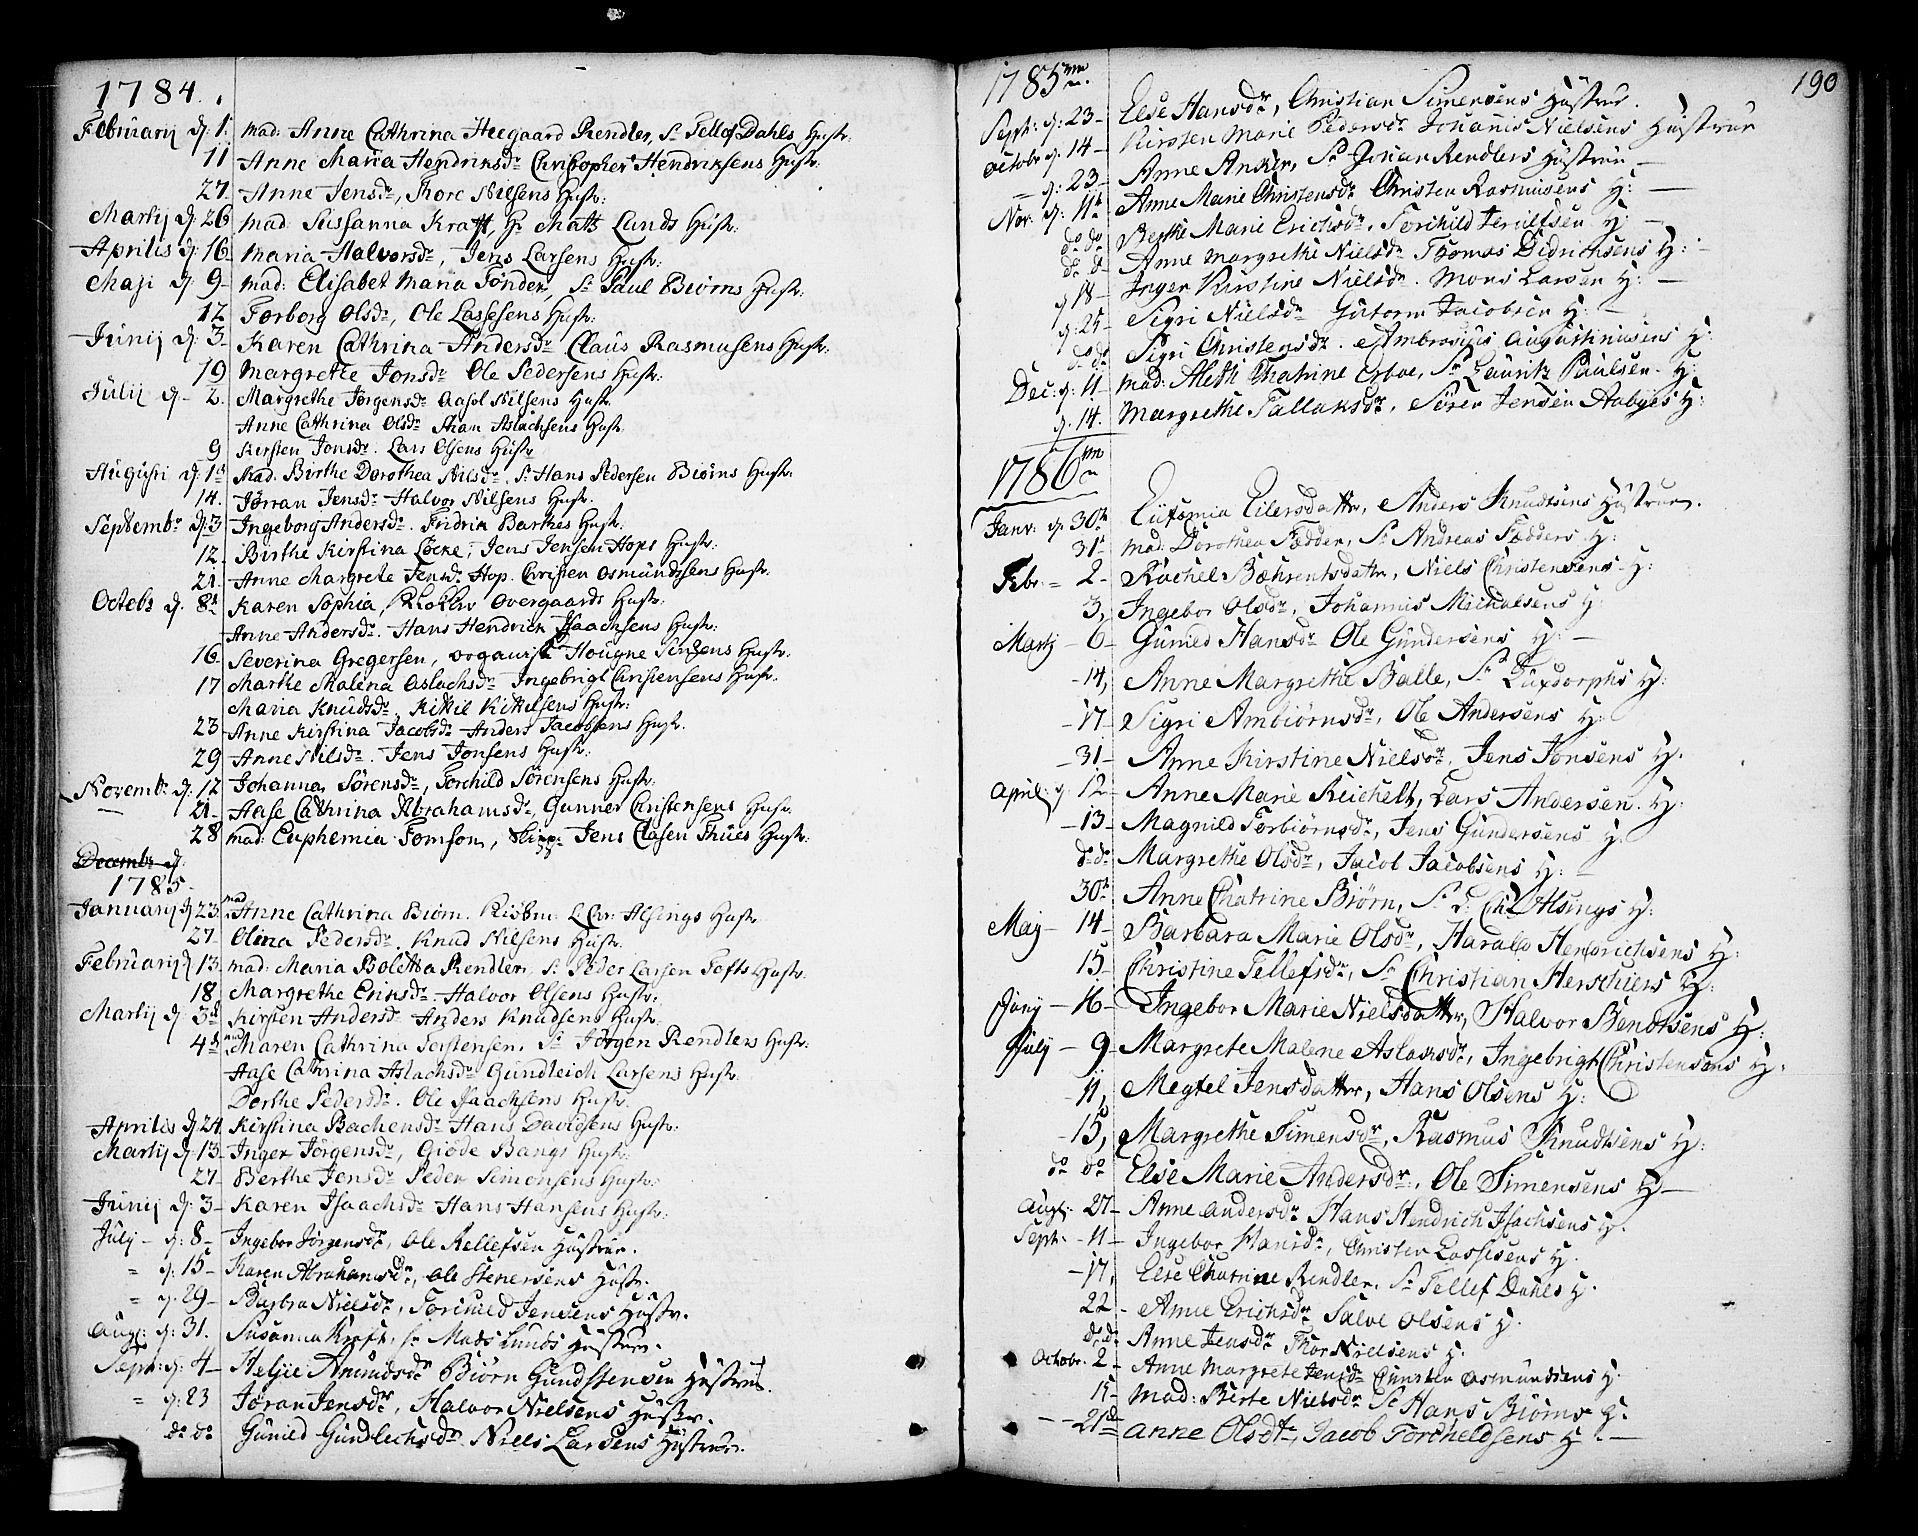 SAKO, Kragerø kirkebøker, F/Fa/L0002: Ministerialbok nr. 2, 1767-1802, s. 190